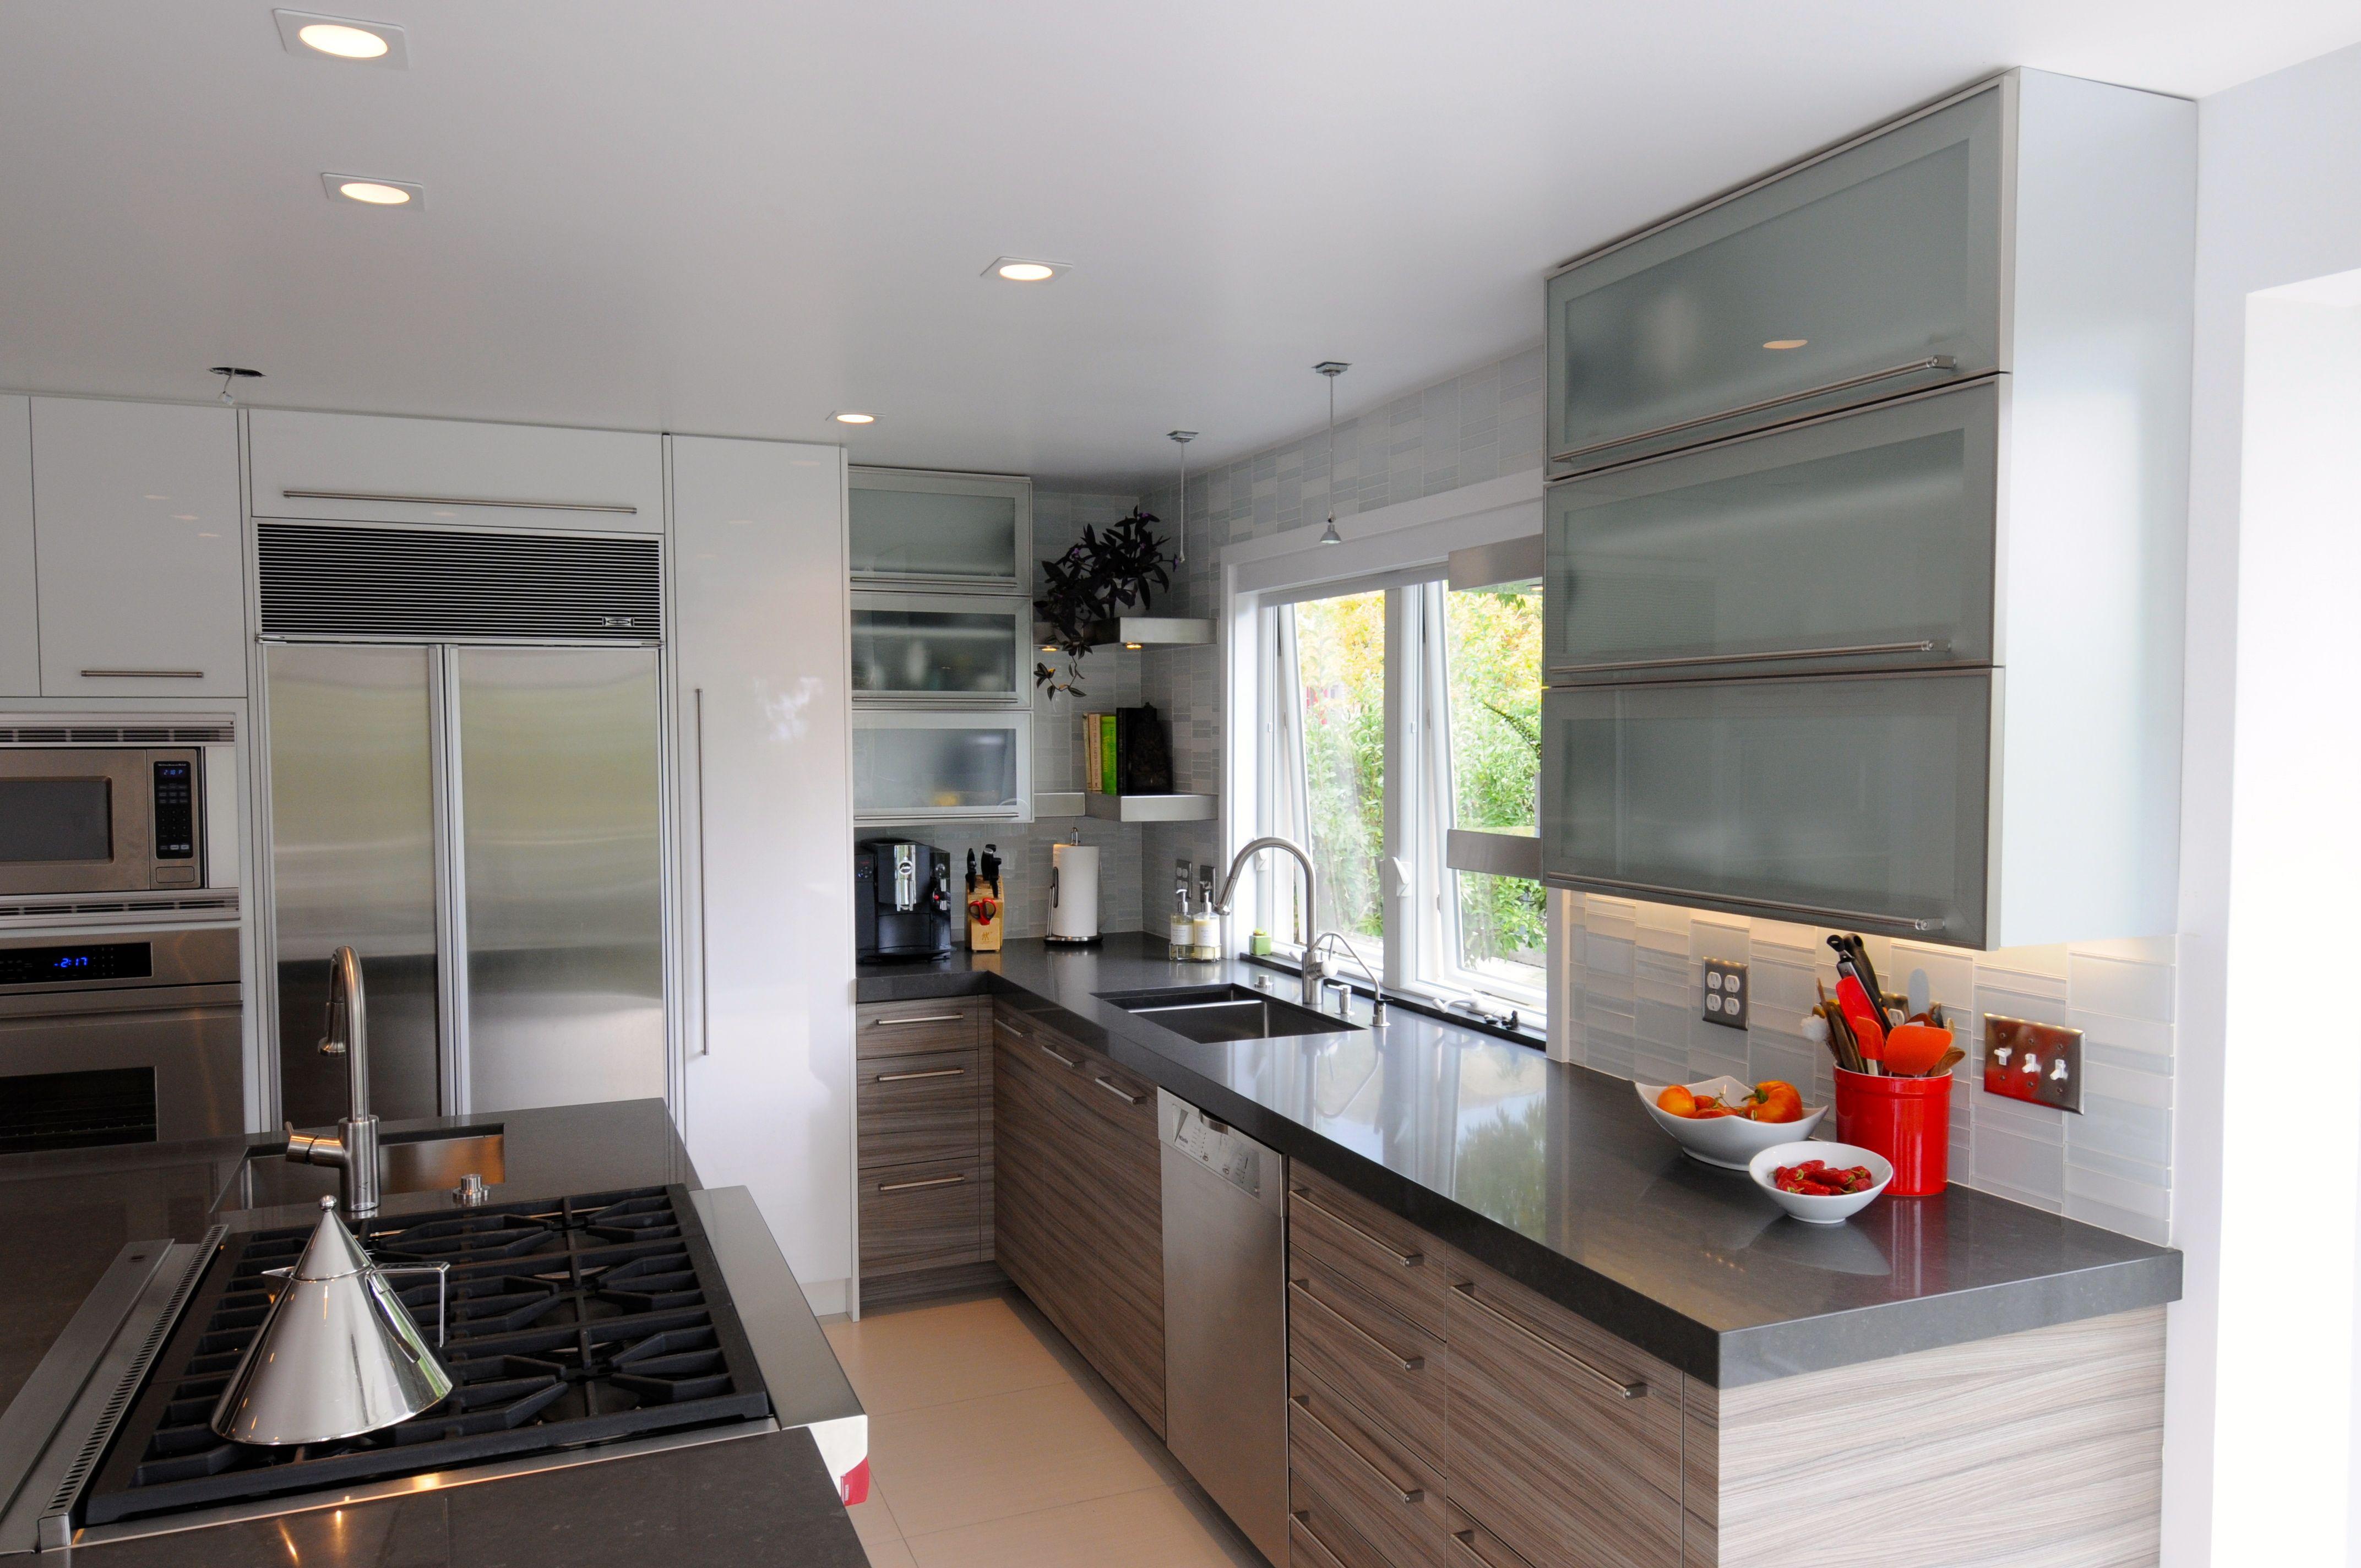 This Modern Kitchen has a mixture of Italian Laminate High Gloss